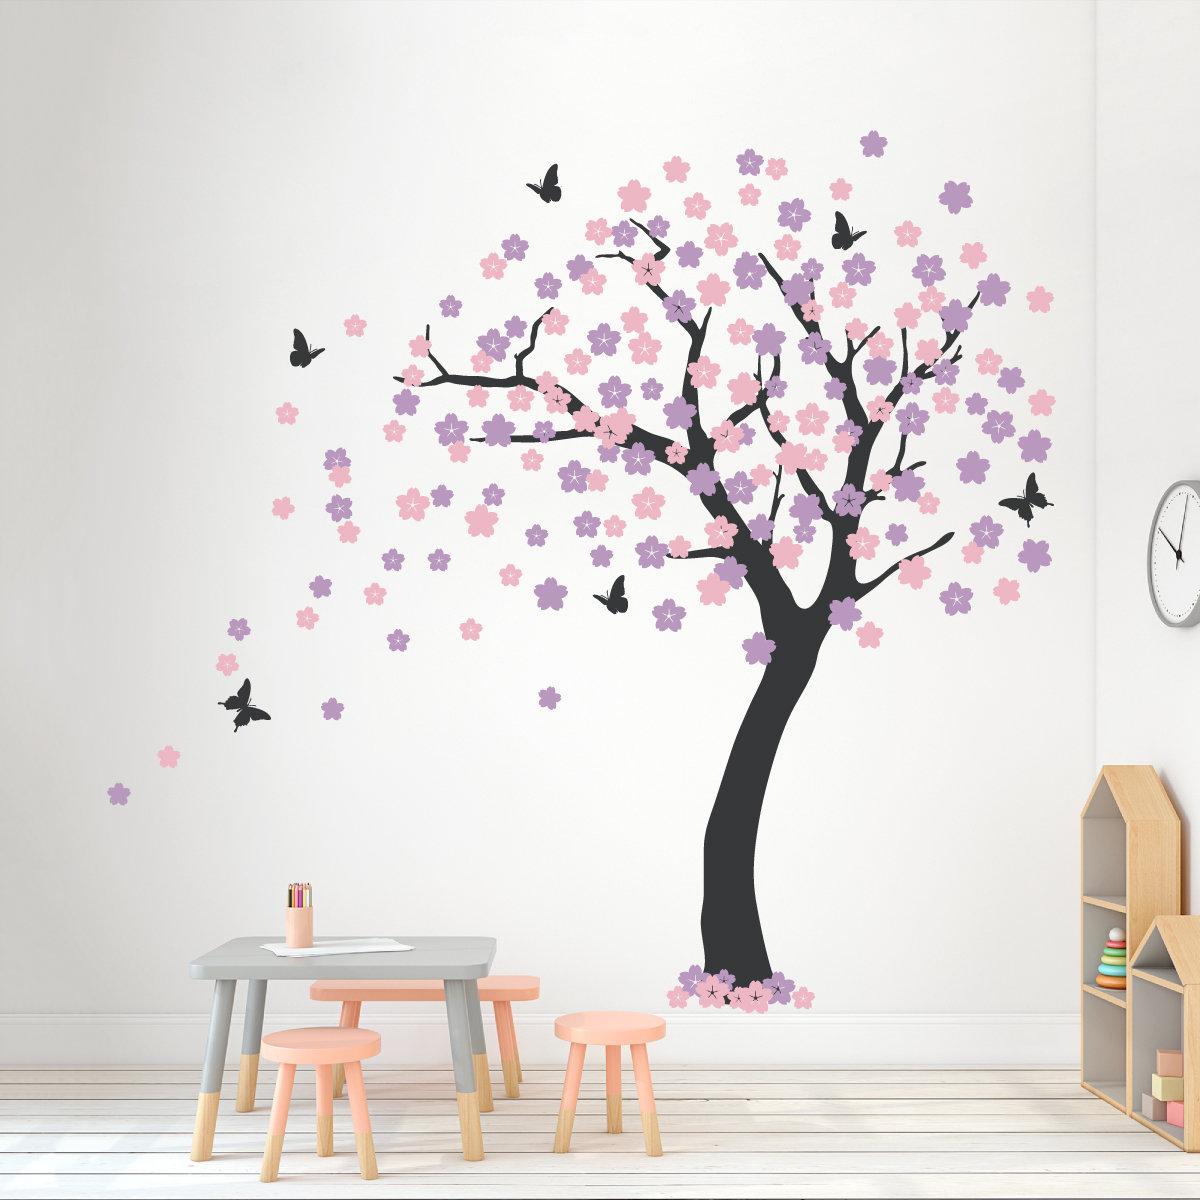 Zoomie Kids Cherry Blossom Tree Wall